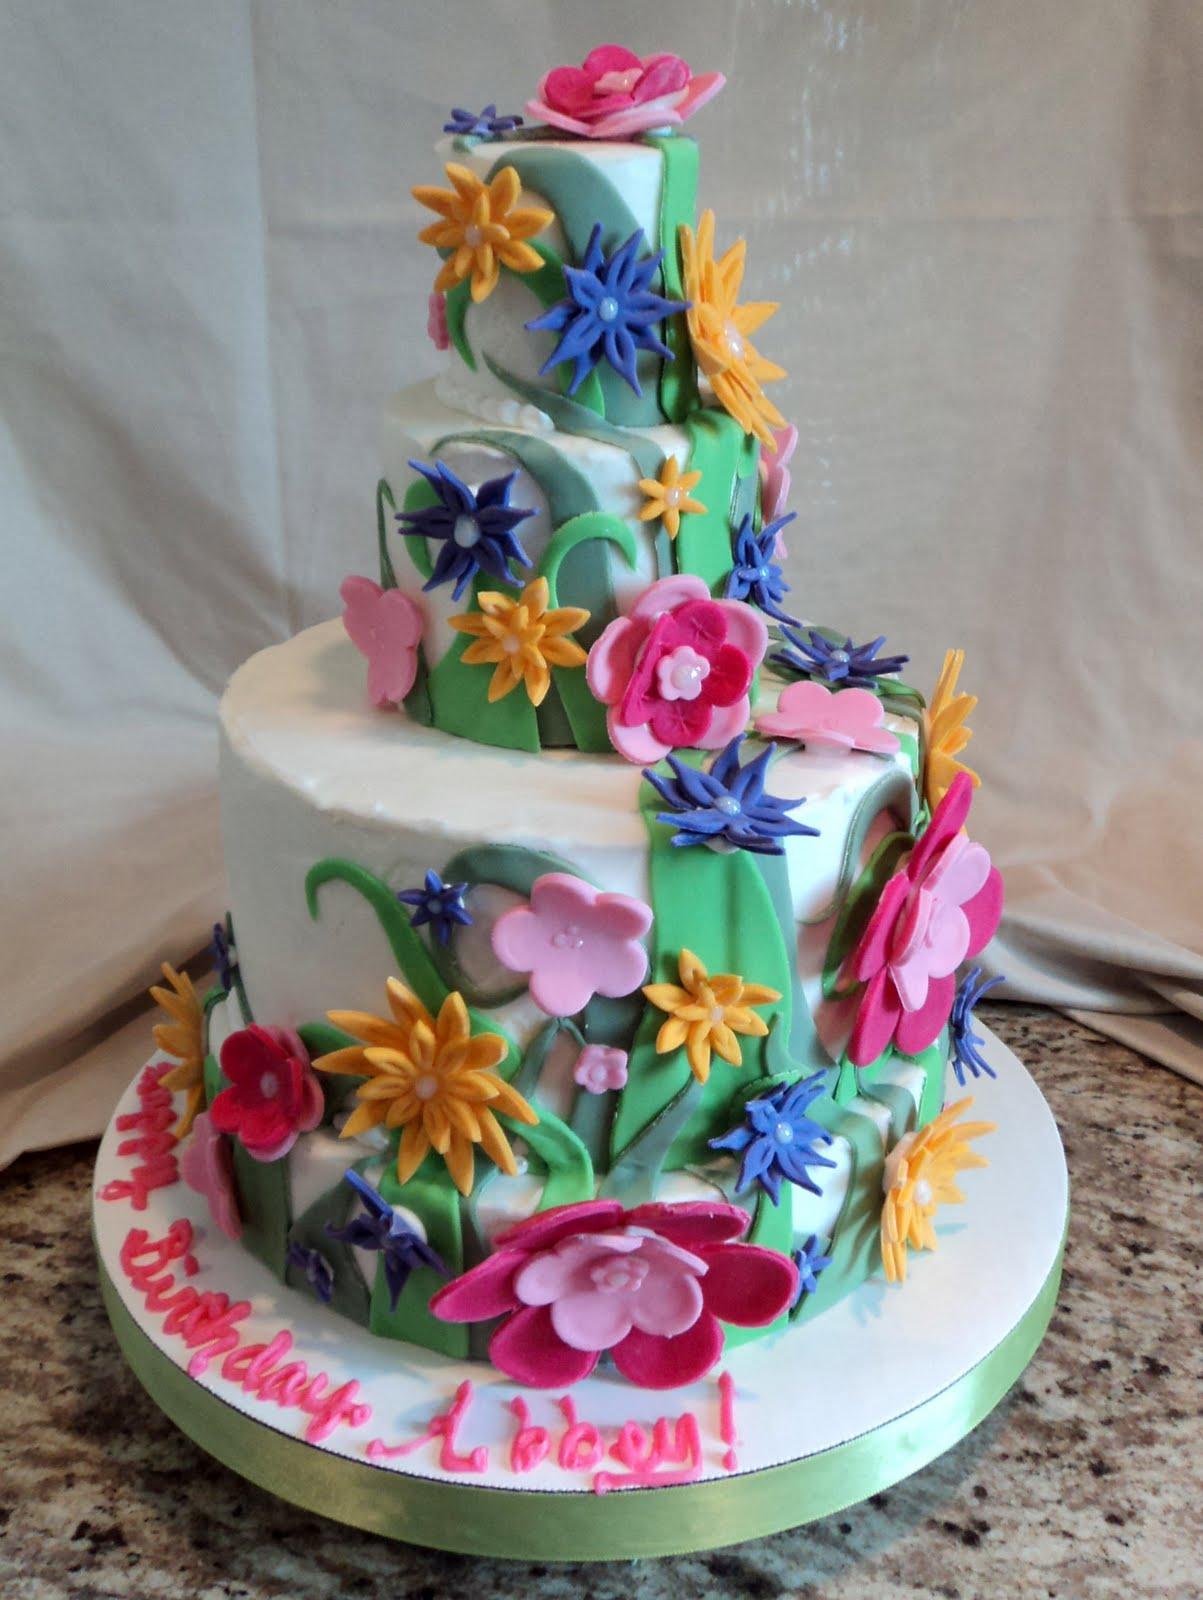 Birthday Cake Ideas Flowers Image Inspiration of Cake and Birthday